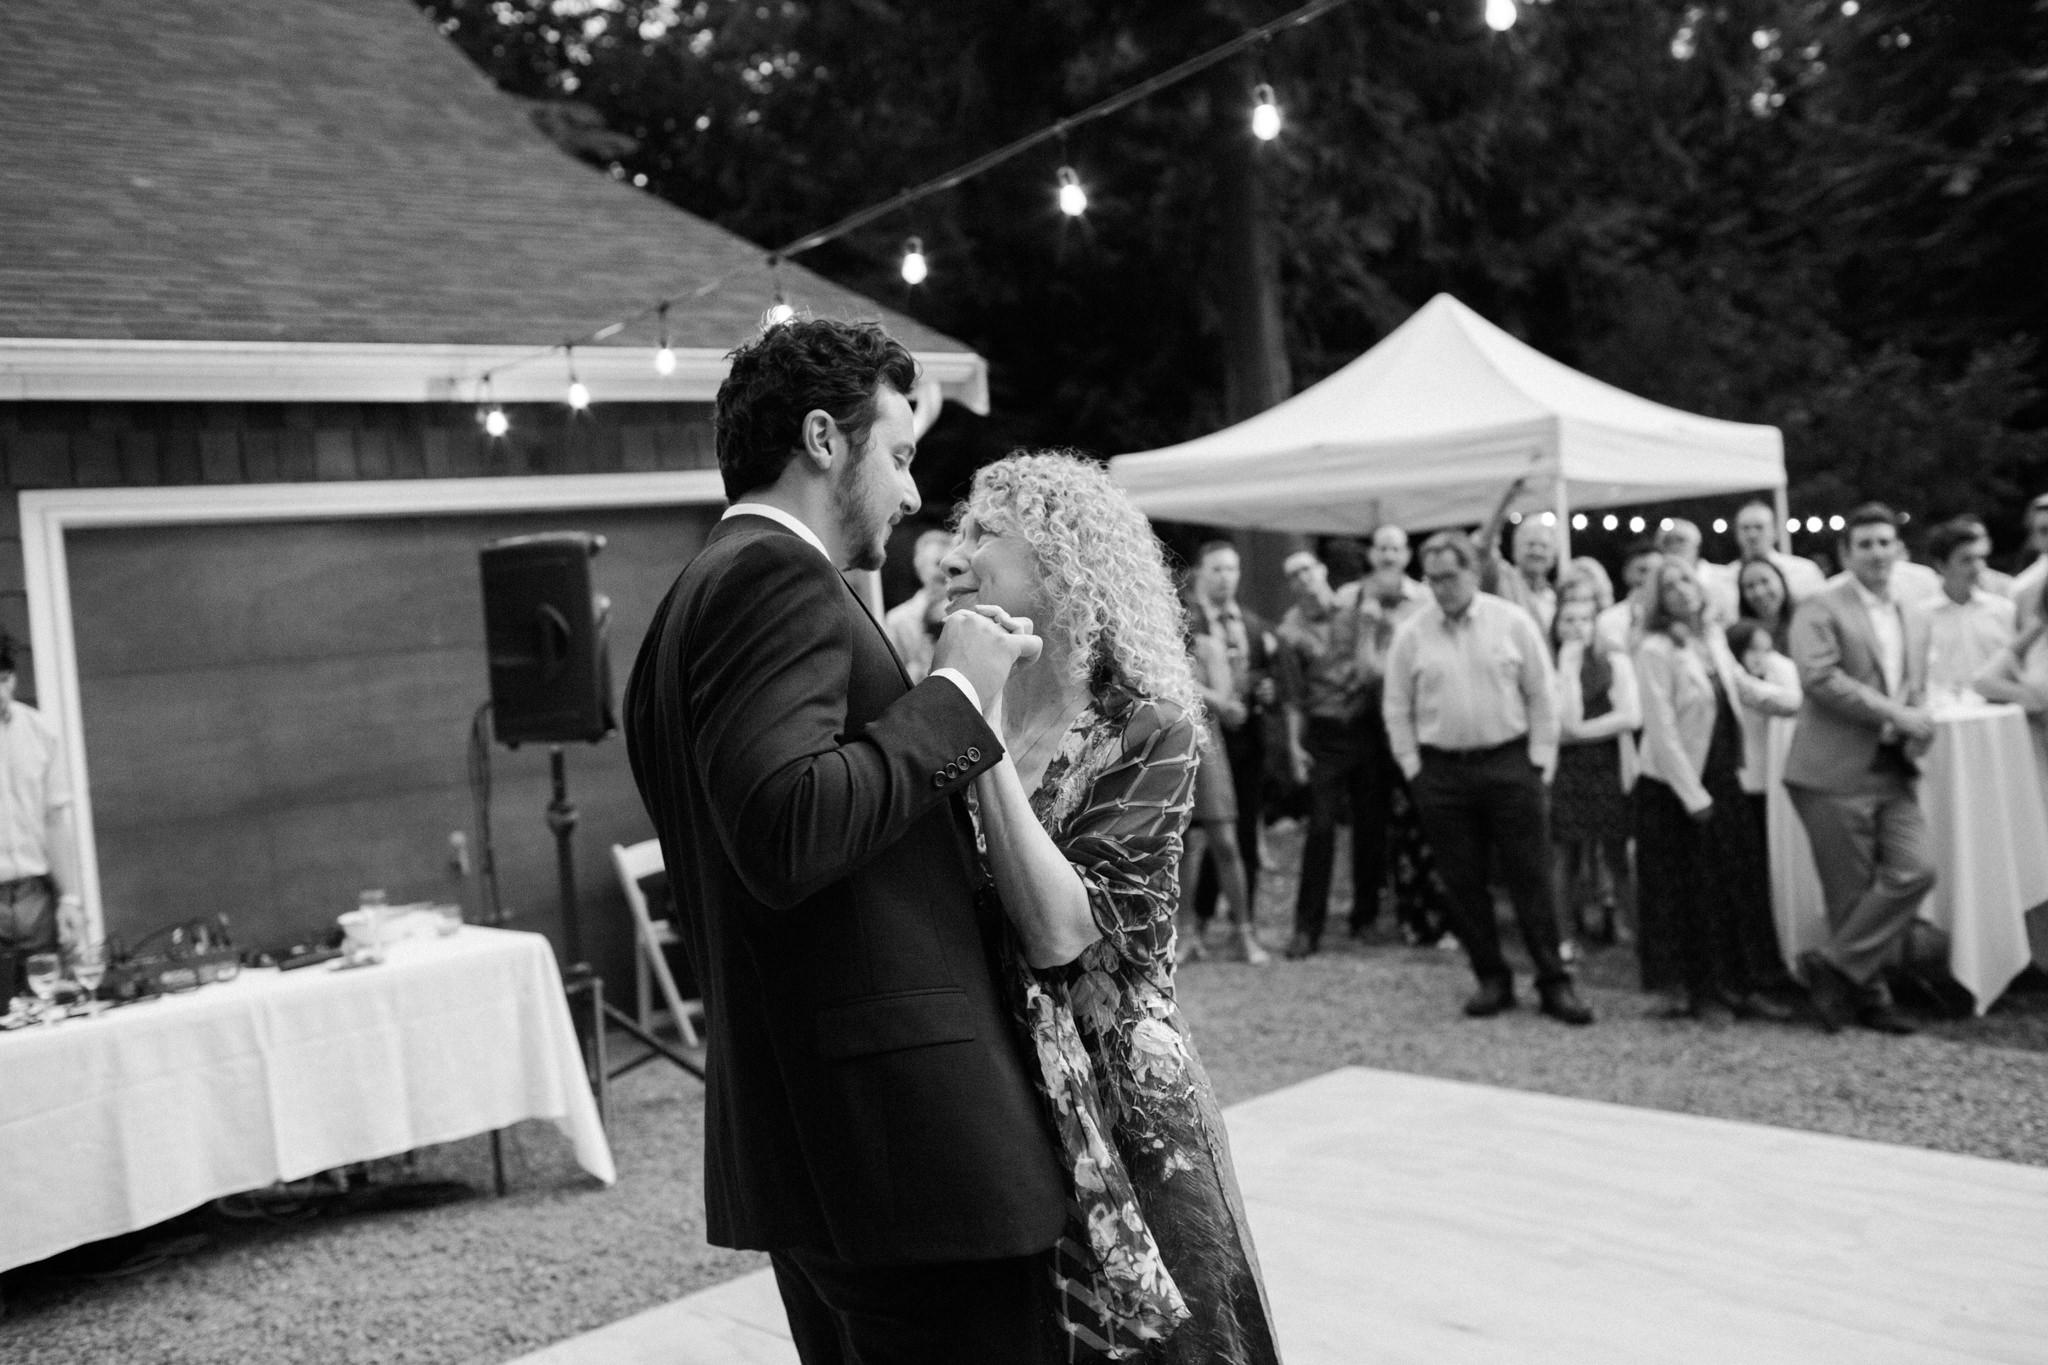 Backyard-Bainbridge-Island-Wedding-Alycia-Lovell-Photography-229.JPG